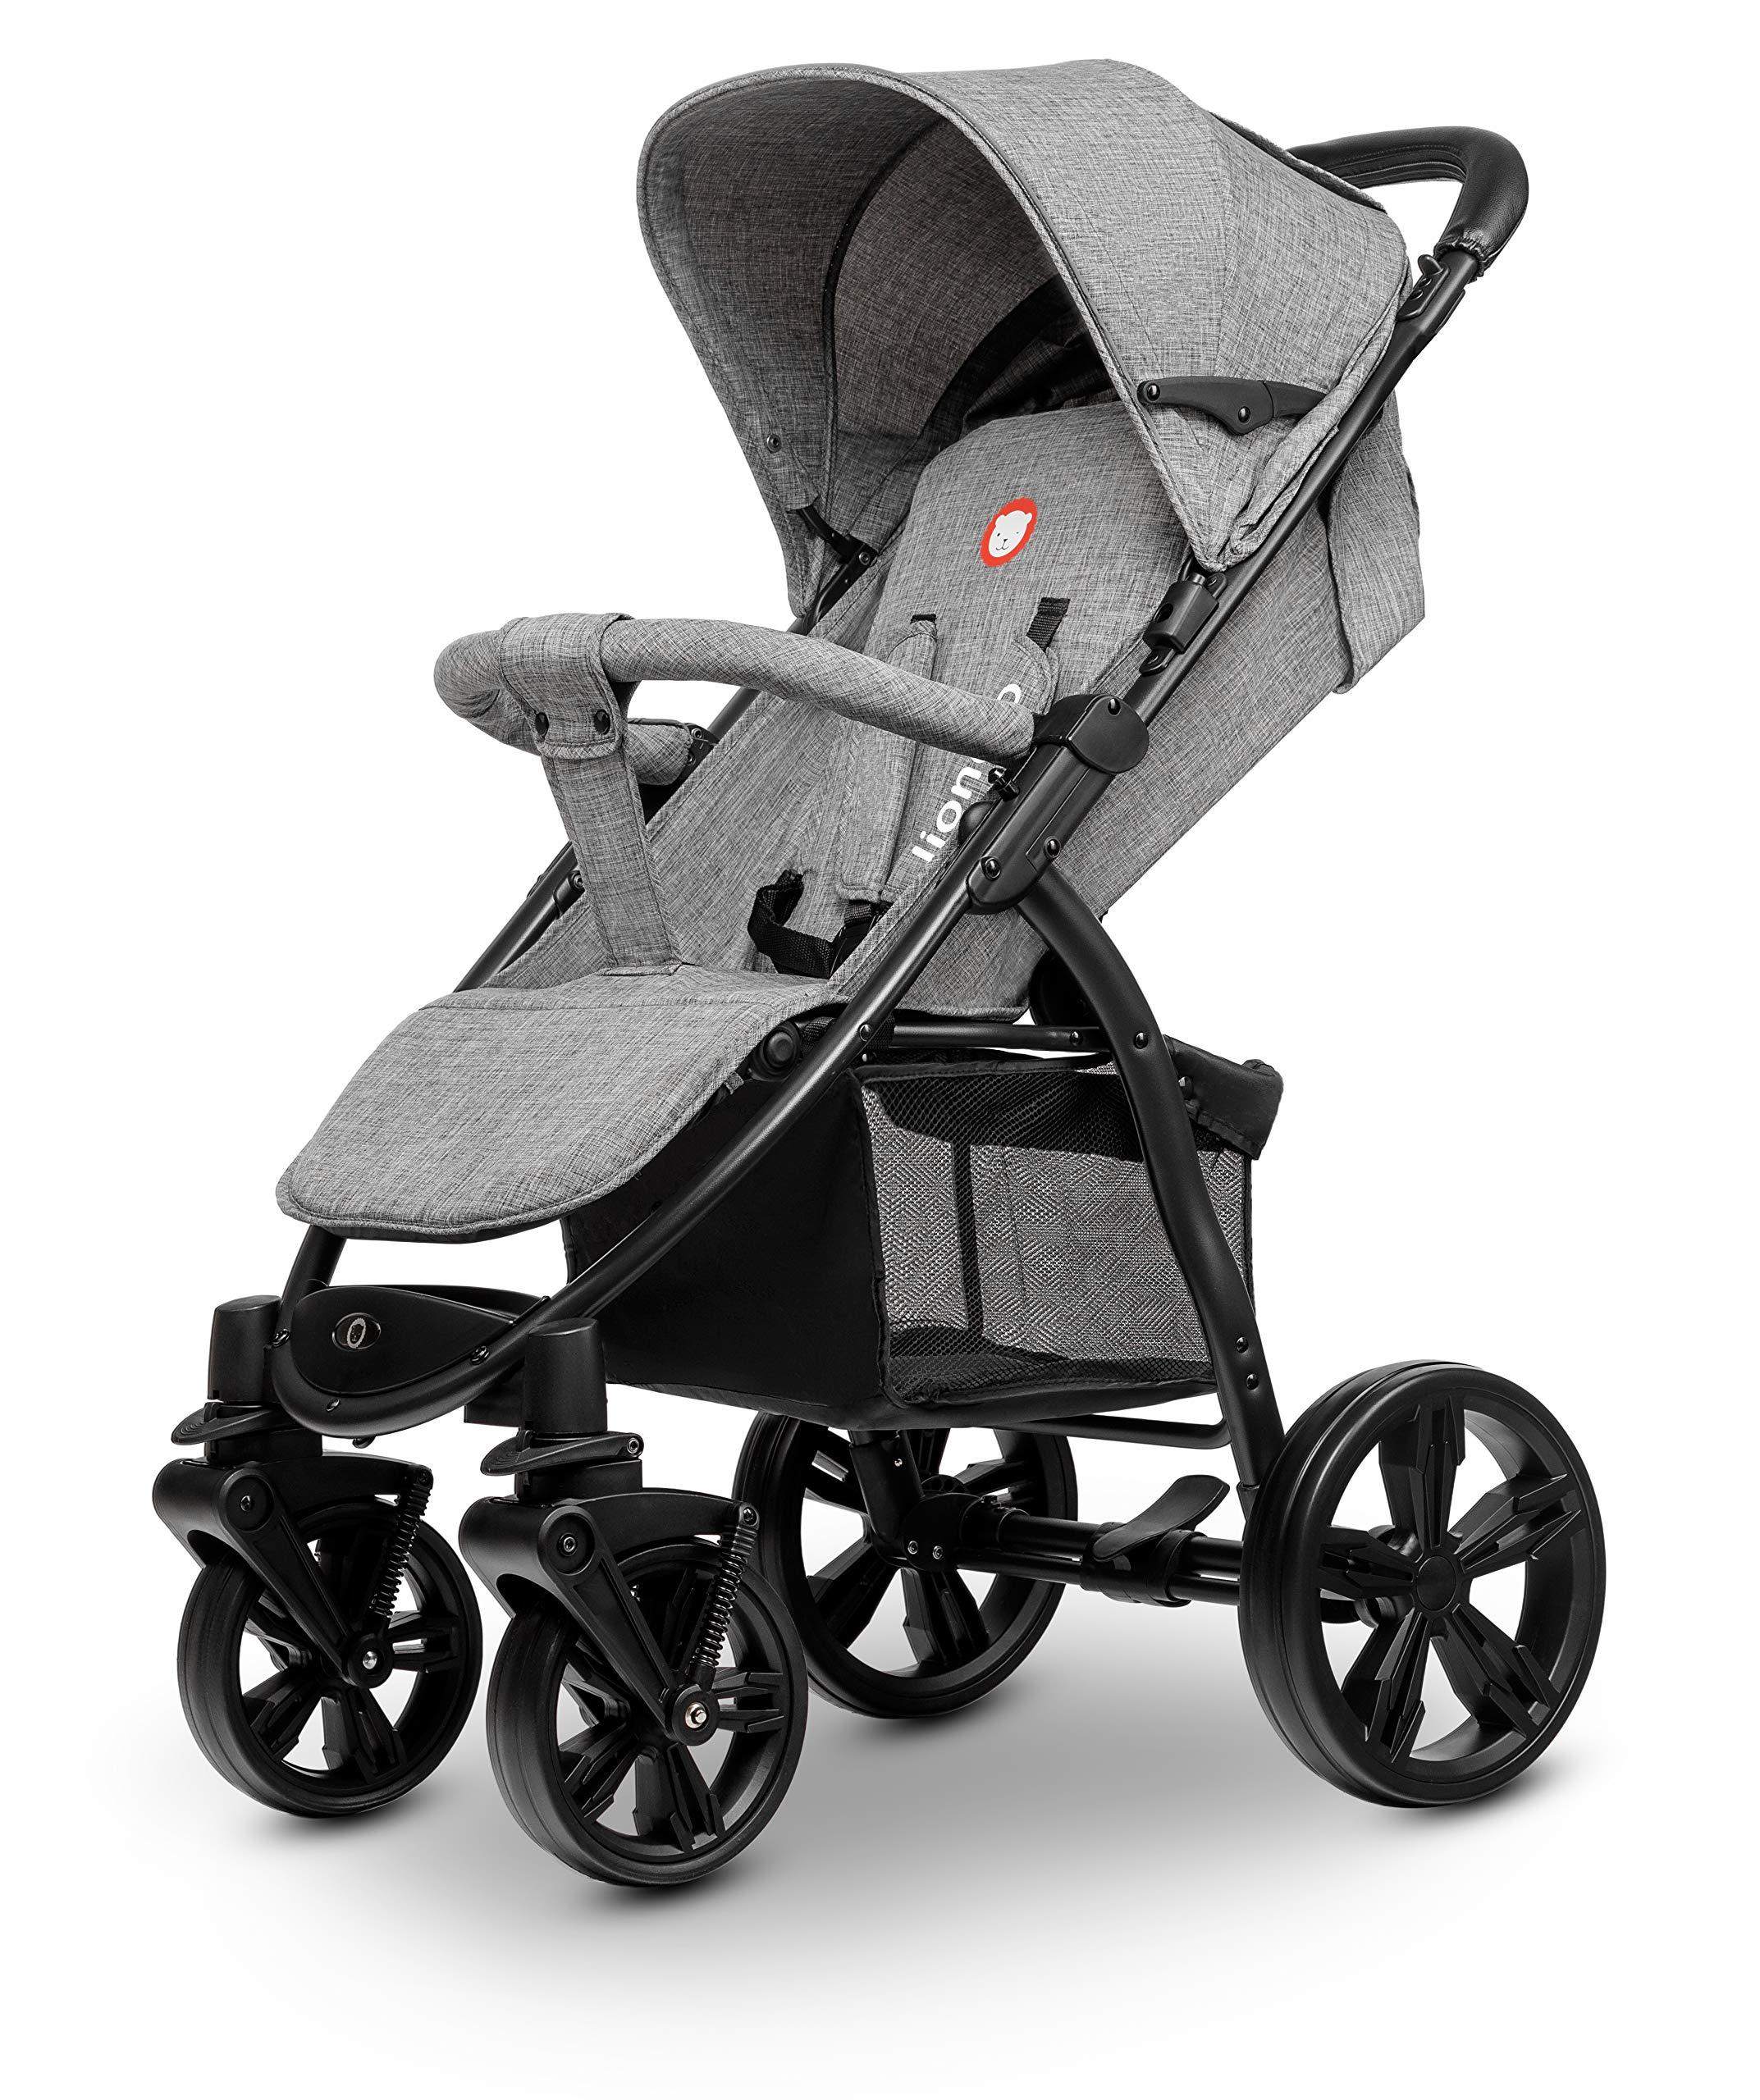 Lionelo 5902581656278 LO-Annet Concrete Stroller Pushchair (Light-Gray)   9